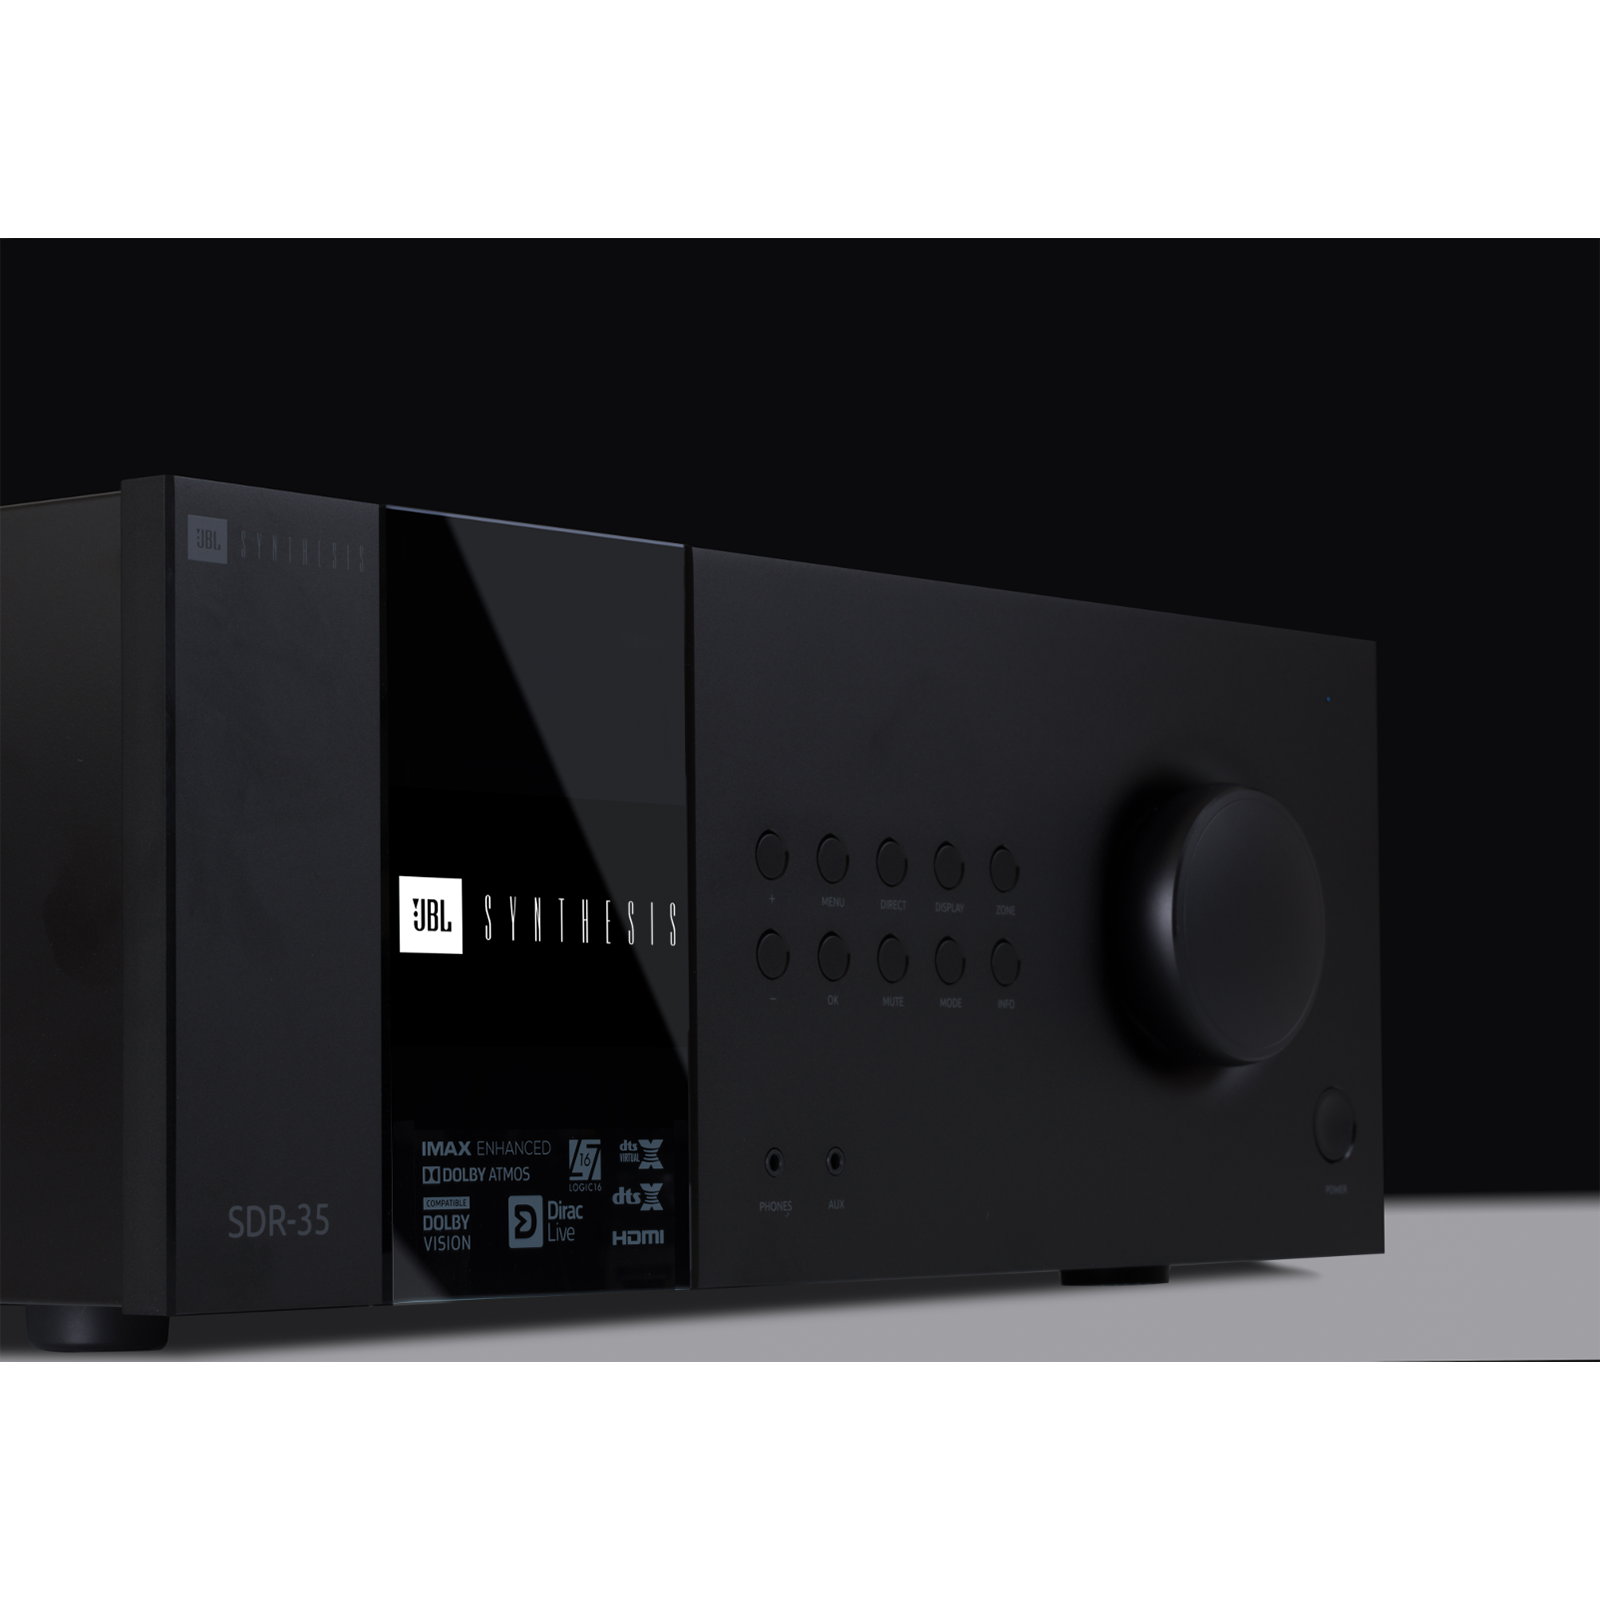 SDR-35 - Black - Class G Immersive Surround Sound AVR w/16 channels of processing - Detailshot 1